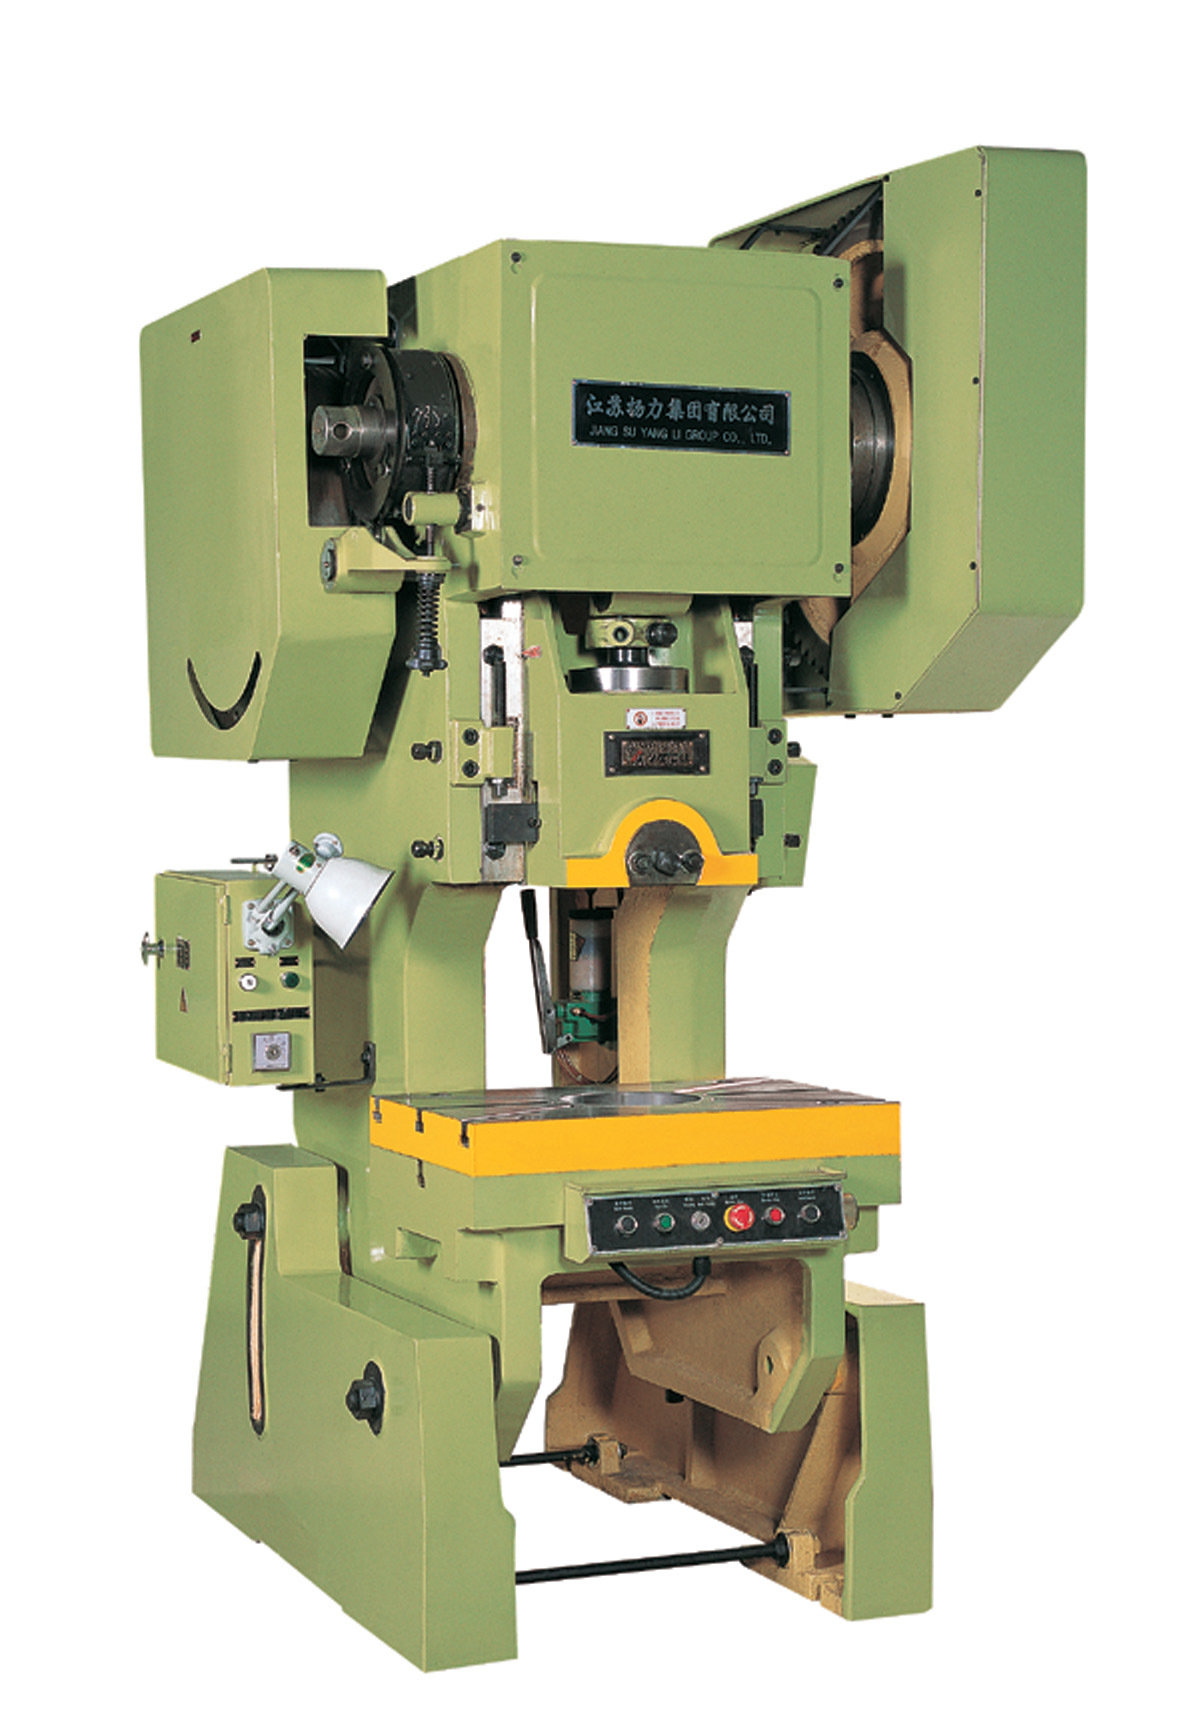 J23 Series Open Back Adjustable Stroke Press Machine